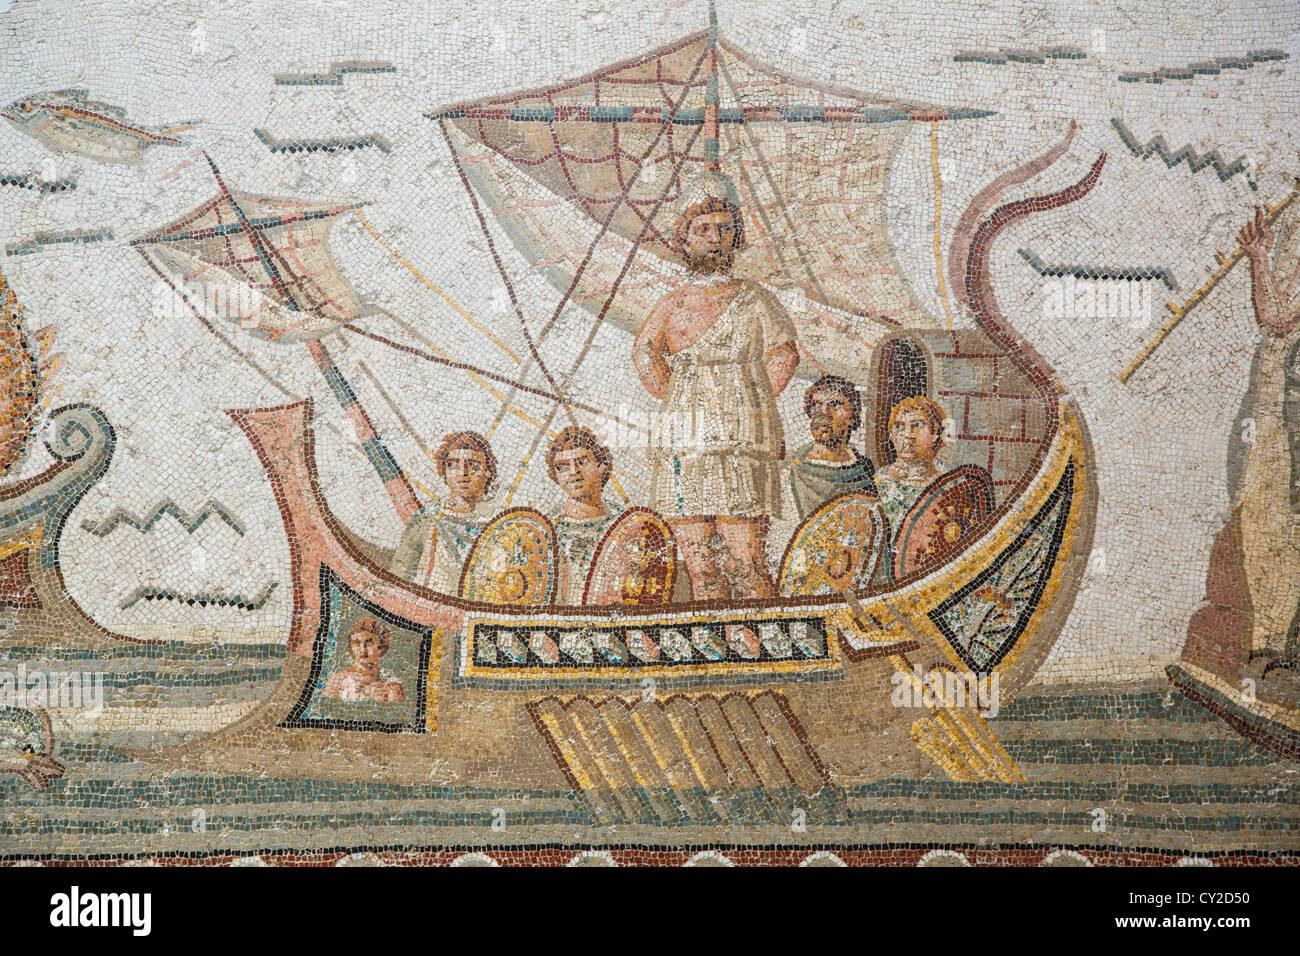 Ulysses Mosaic from Dougga at the Bardo Museum in Tunis Tunisia Stock Photo